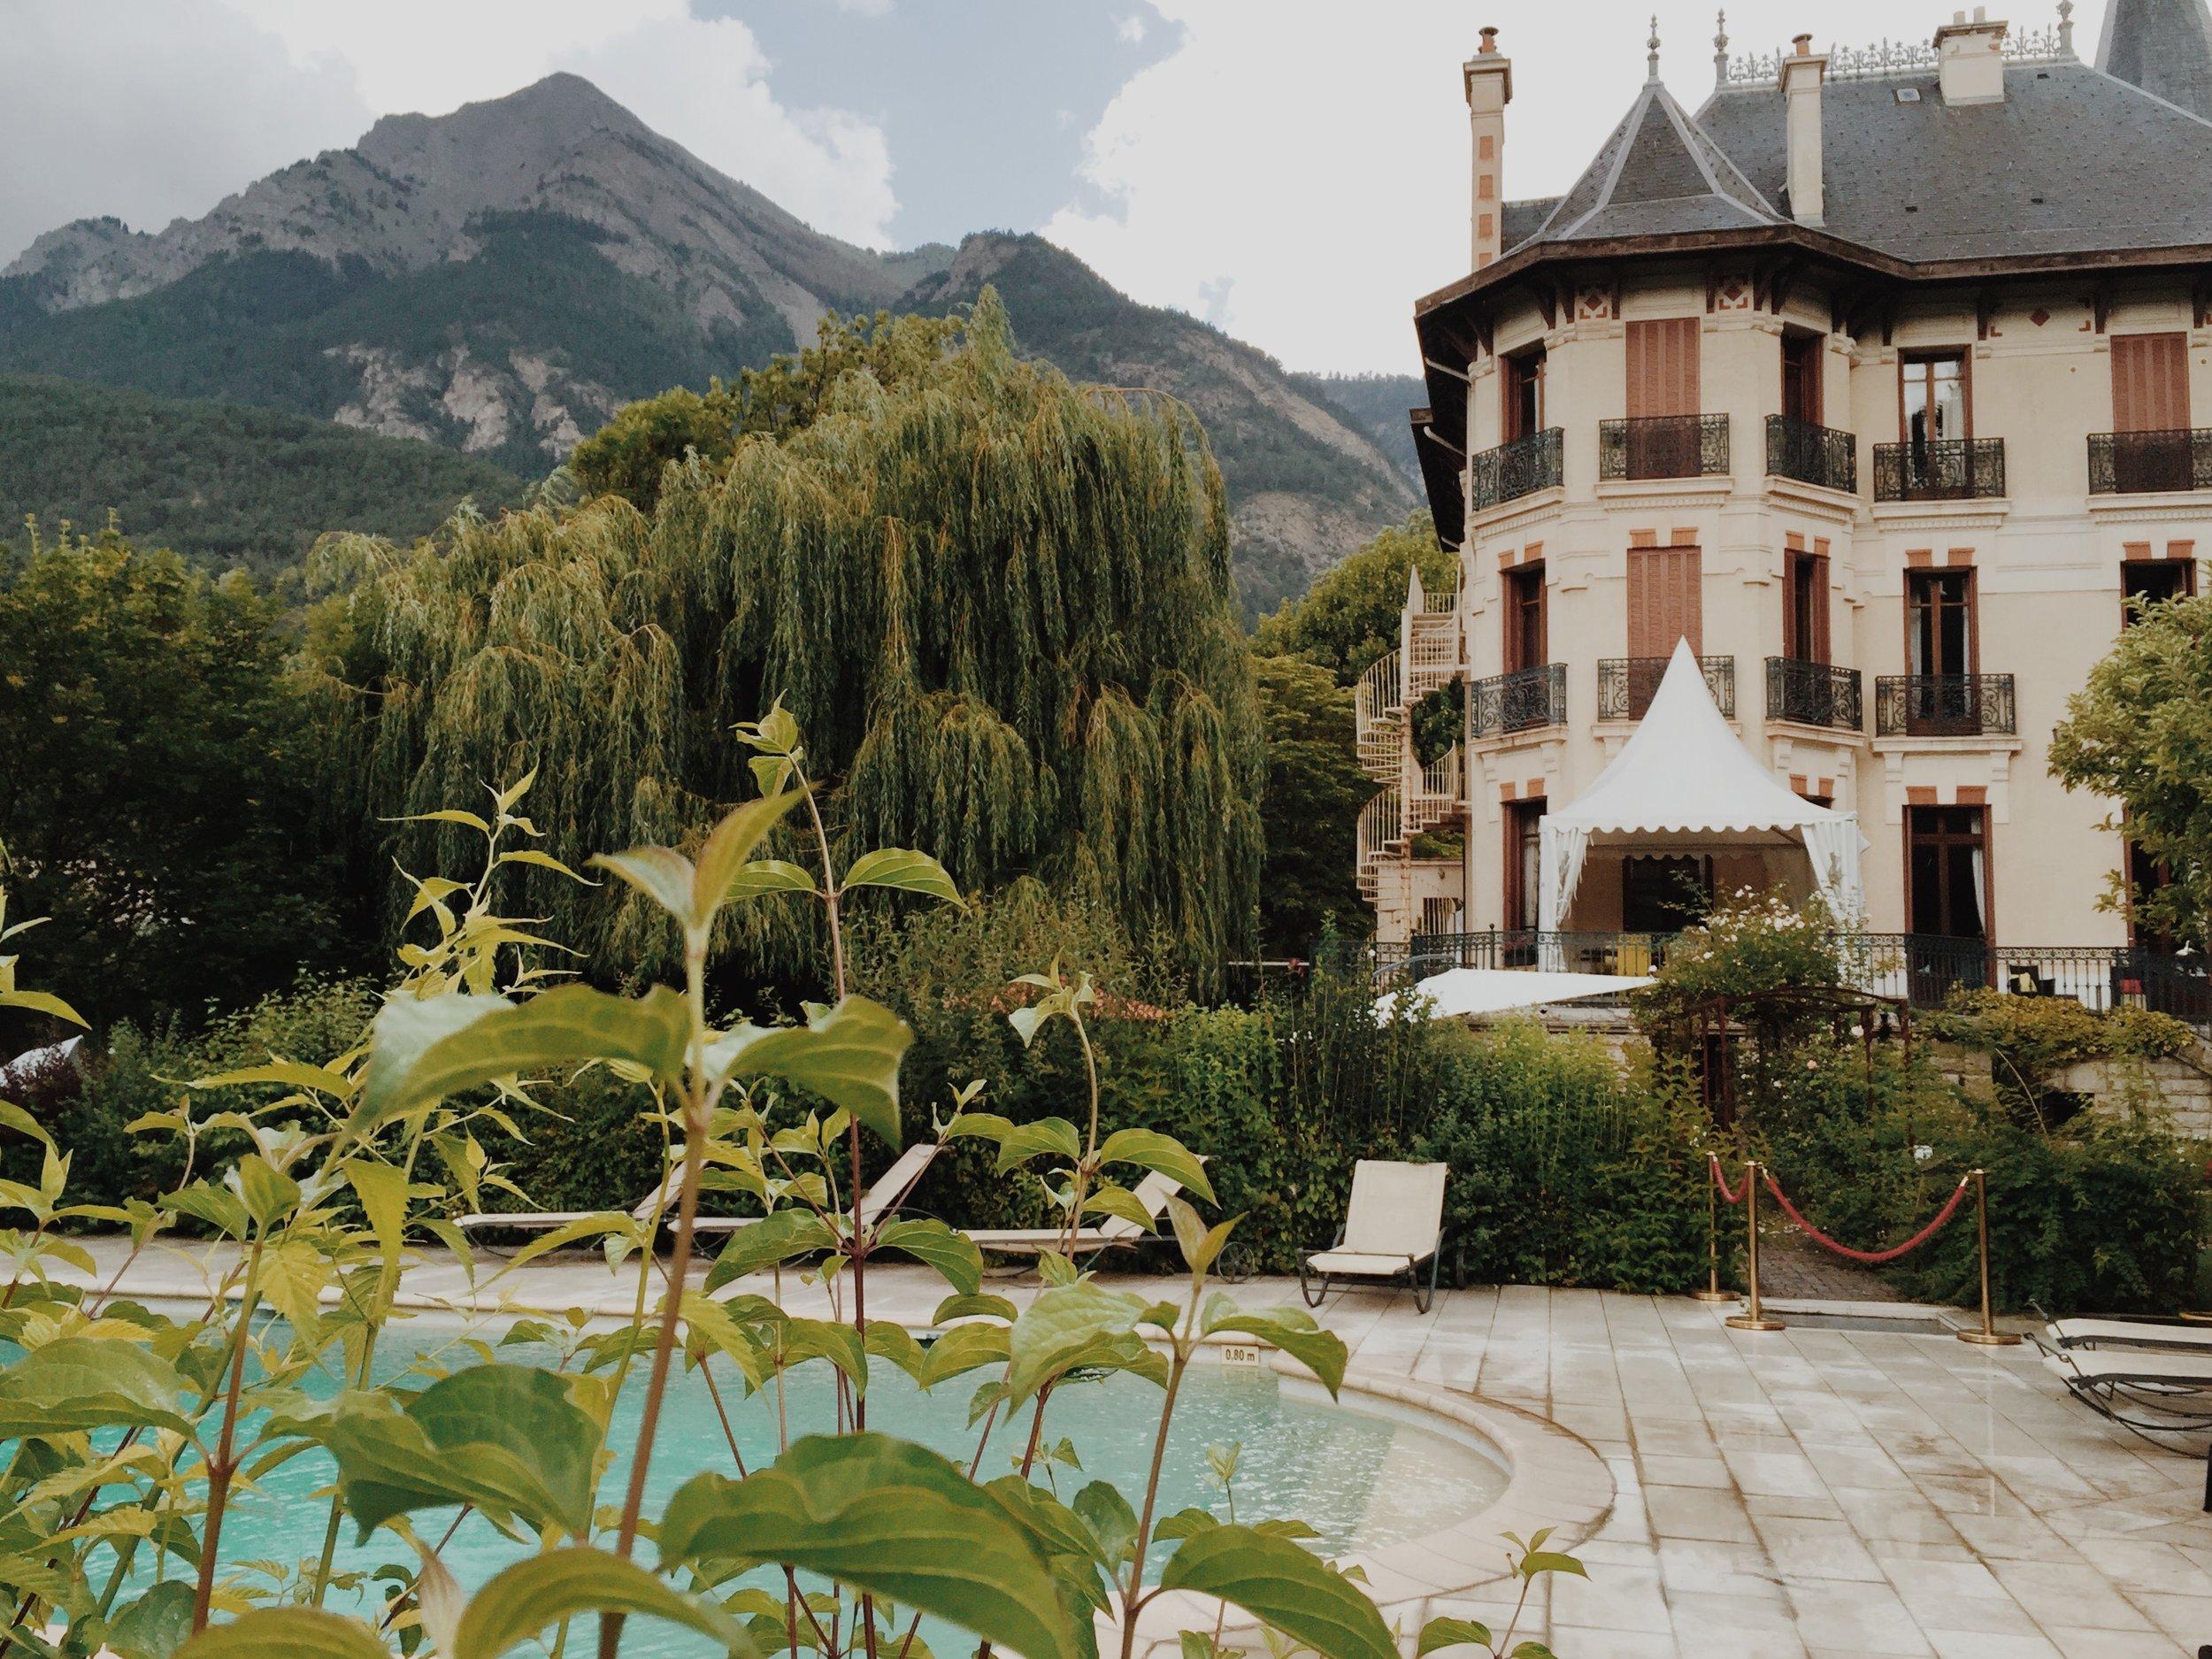 Villa Morelia, Jausiers, France